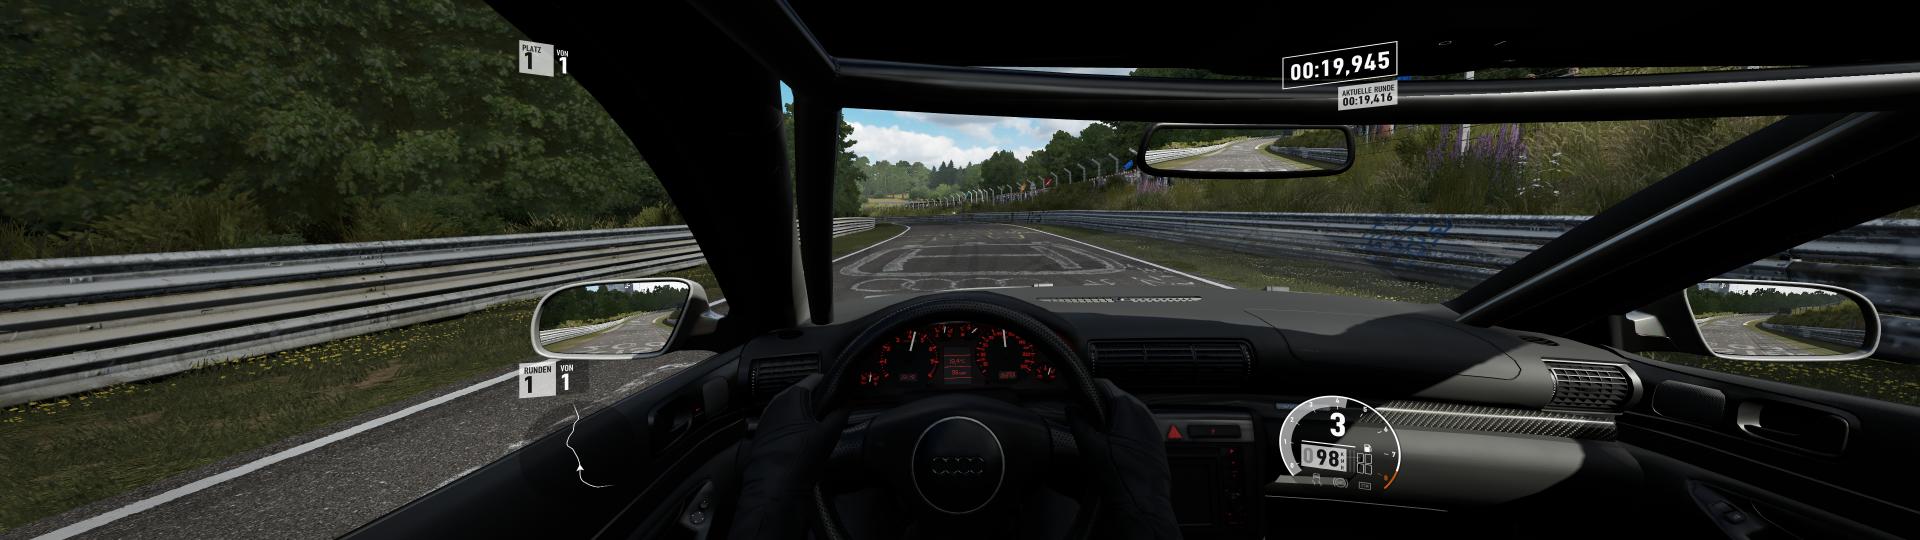 Forza Motorsport 7 15.06.2018 22_19_43 - Kopie (Large).png